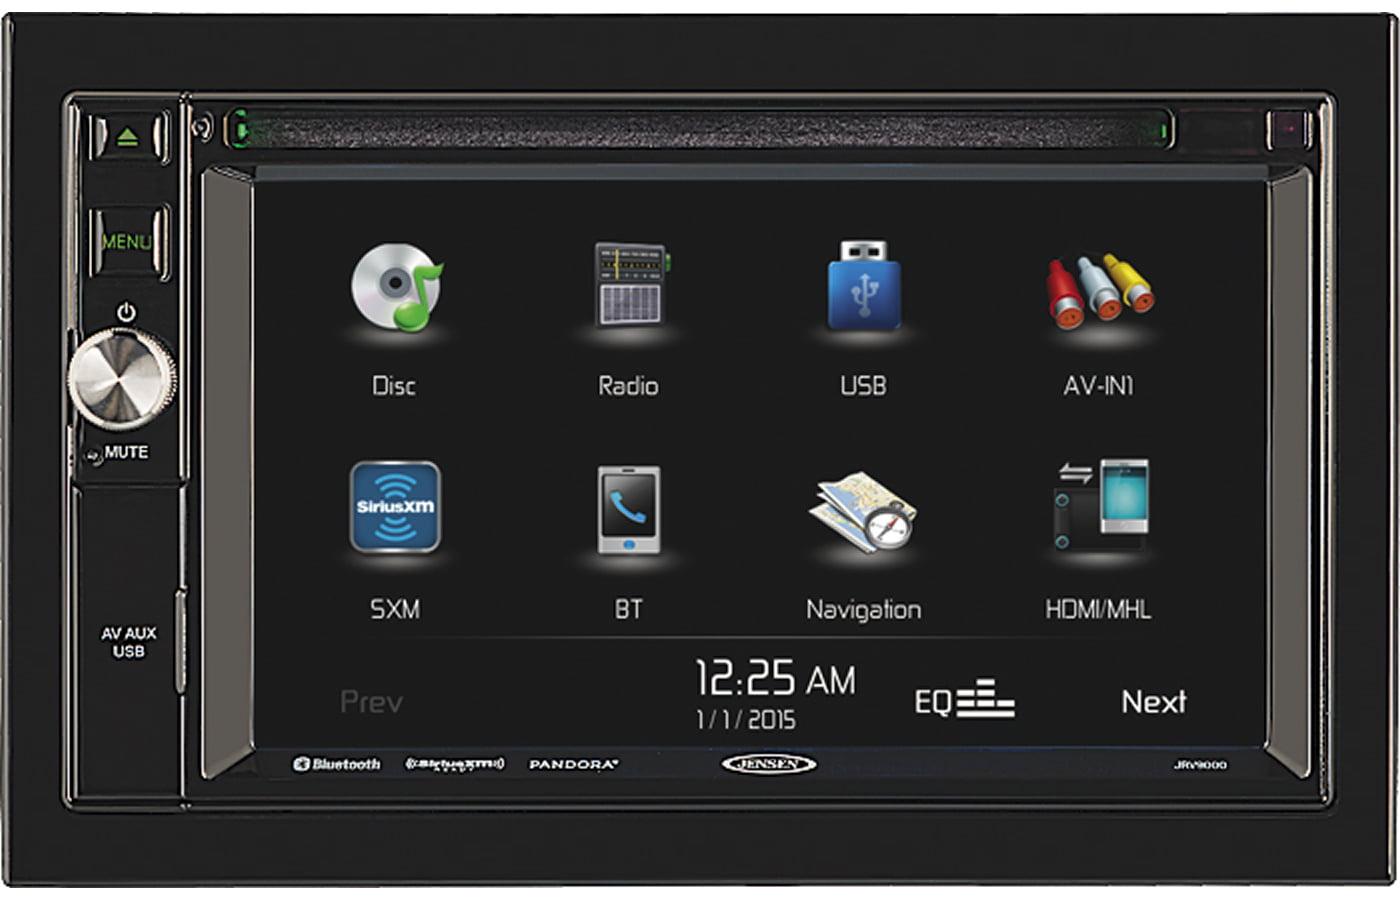 "JENSEN JRV9000R JRV9000 R 2.0 Double DIN 6.2"" Touchscreen Navigation   Bluetooth Multimedia Receiver System with... by Jensen"